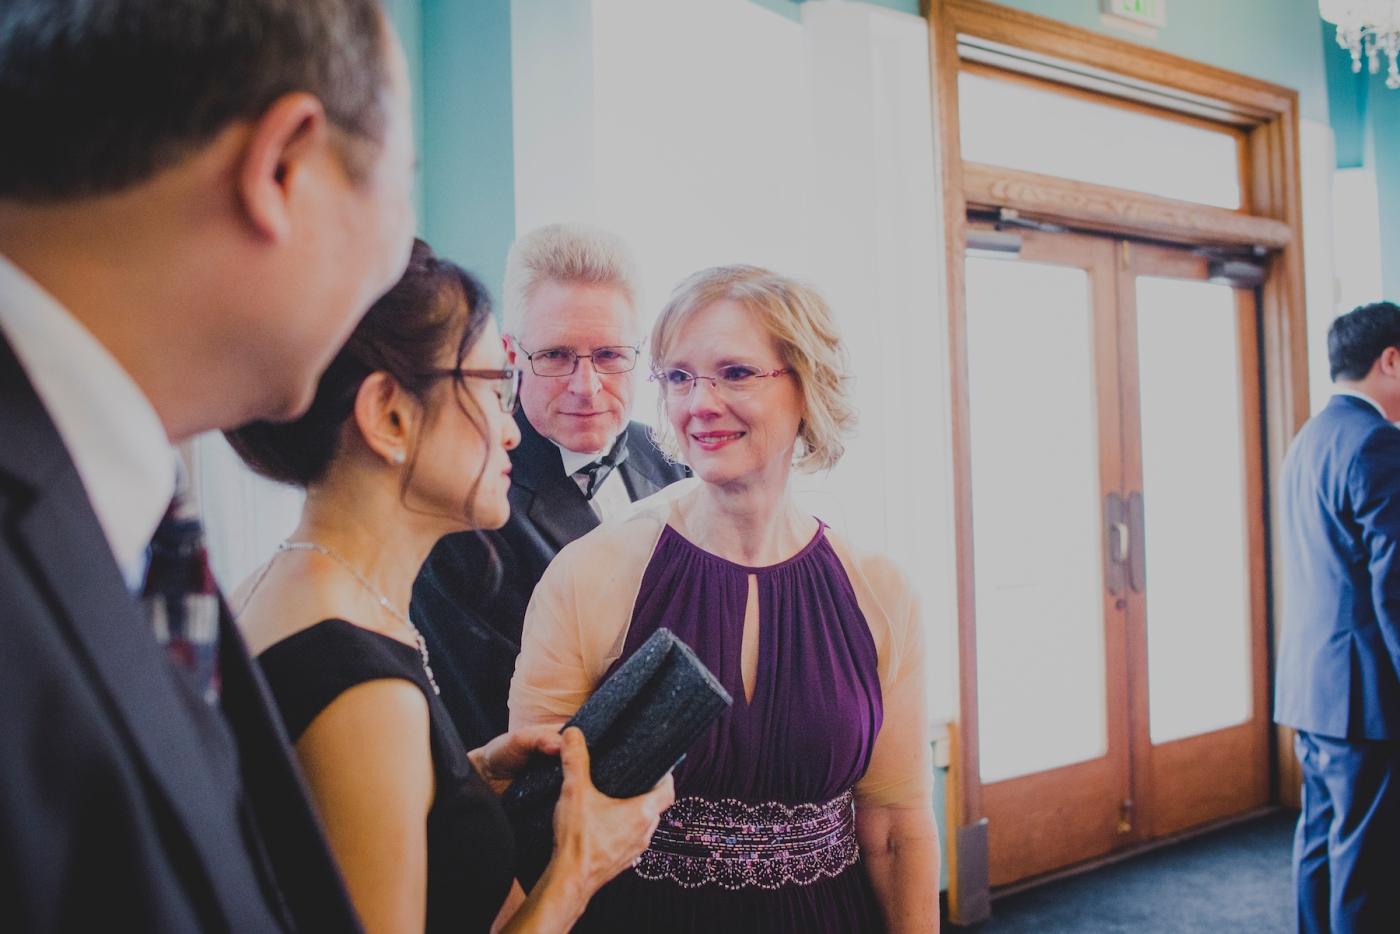 DSC_3018Everett_Wedding_Ballroom_Jane_Speleers_photography_Rachel_and_Edmund_teaceremony_2017